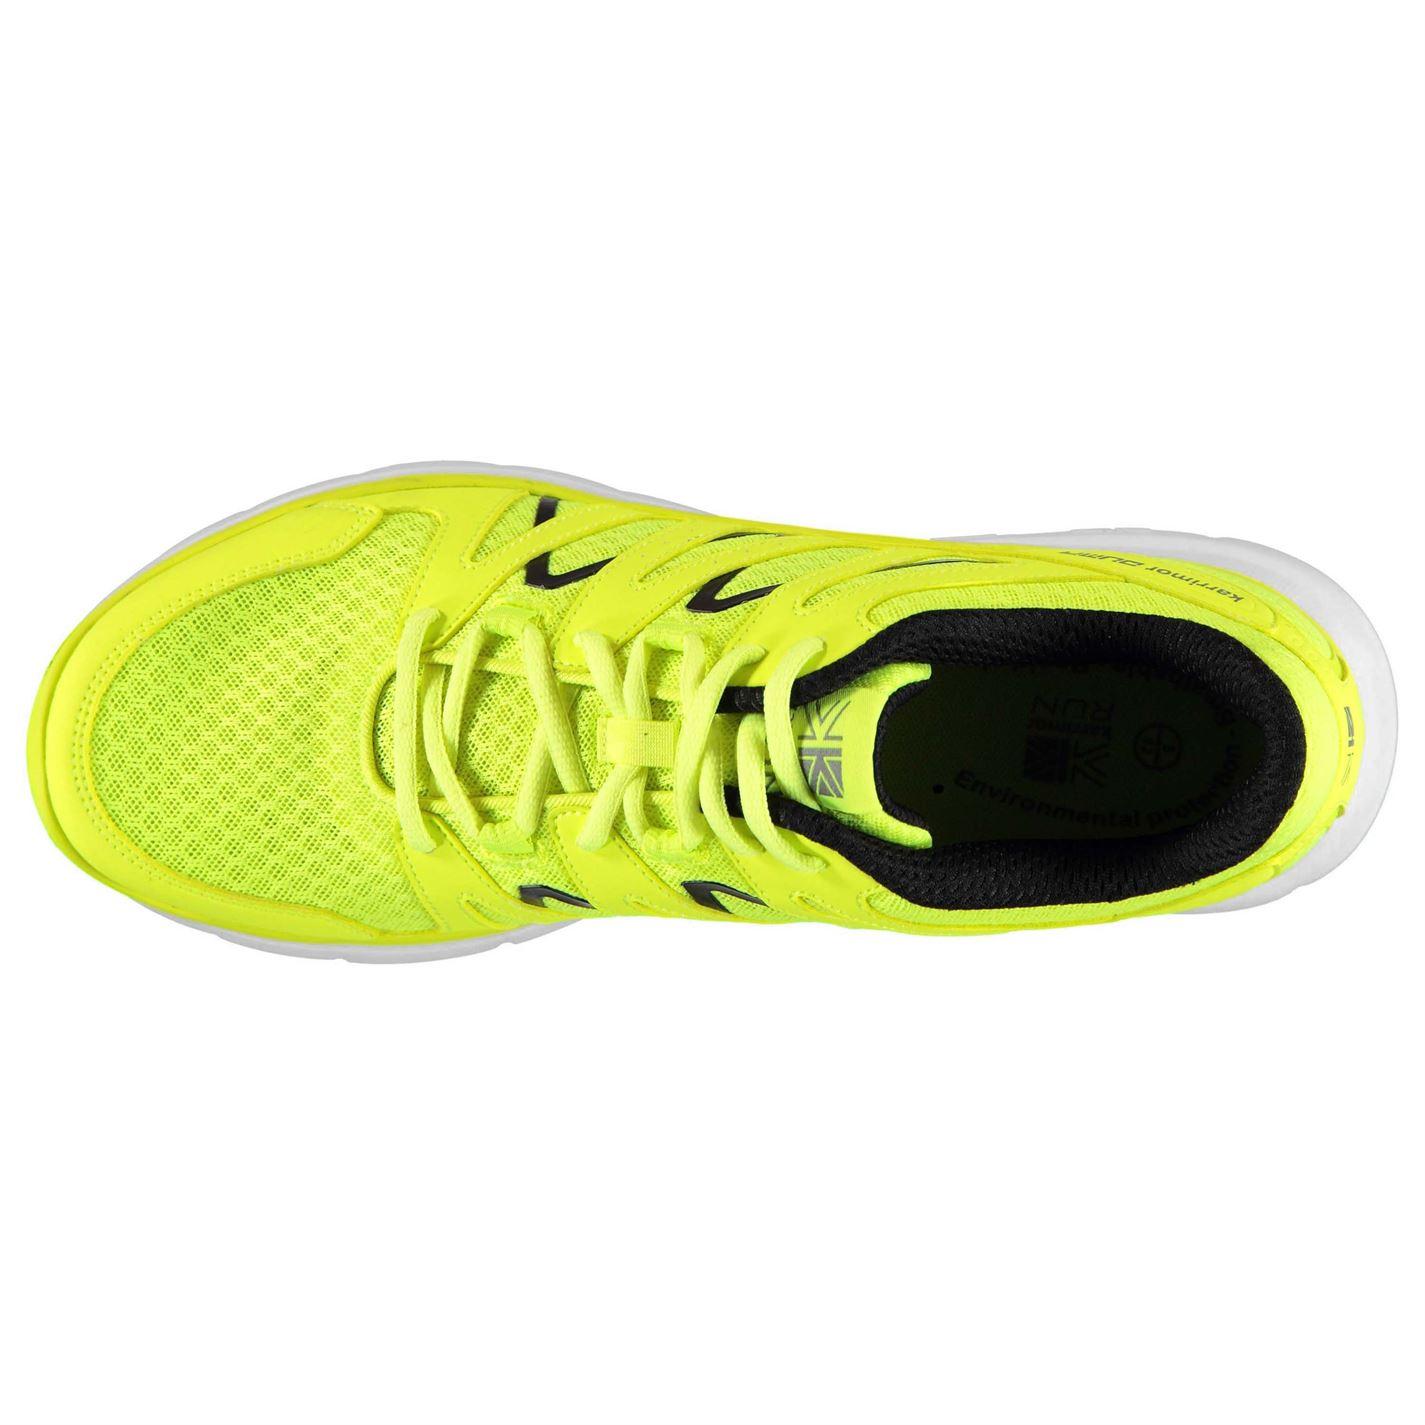 Karrimor-Mens-Duma-Trainers-Lace-Up-Sports-Running-Cross-Training-Shoes thumbnail 54